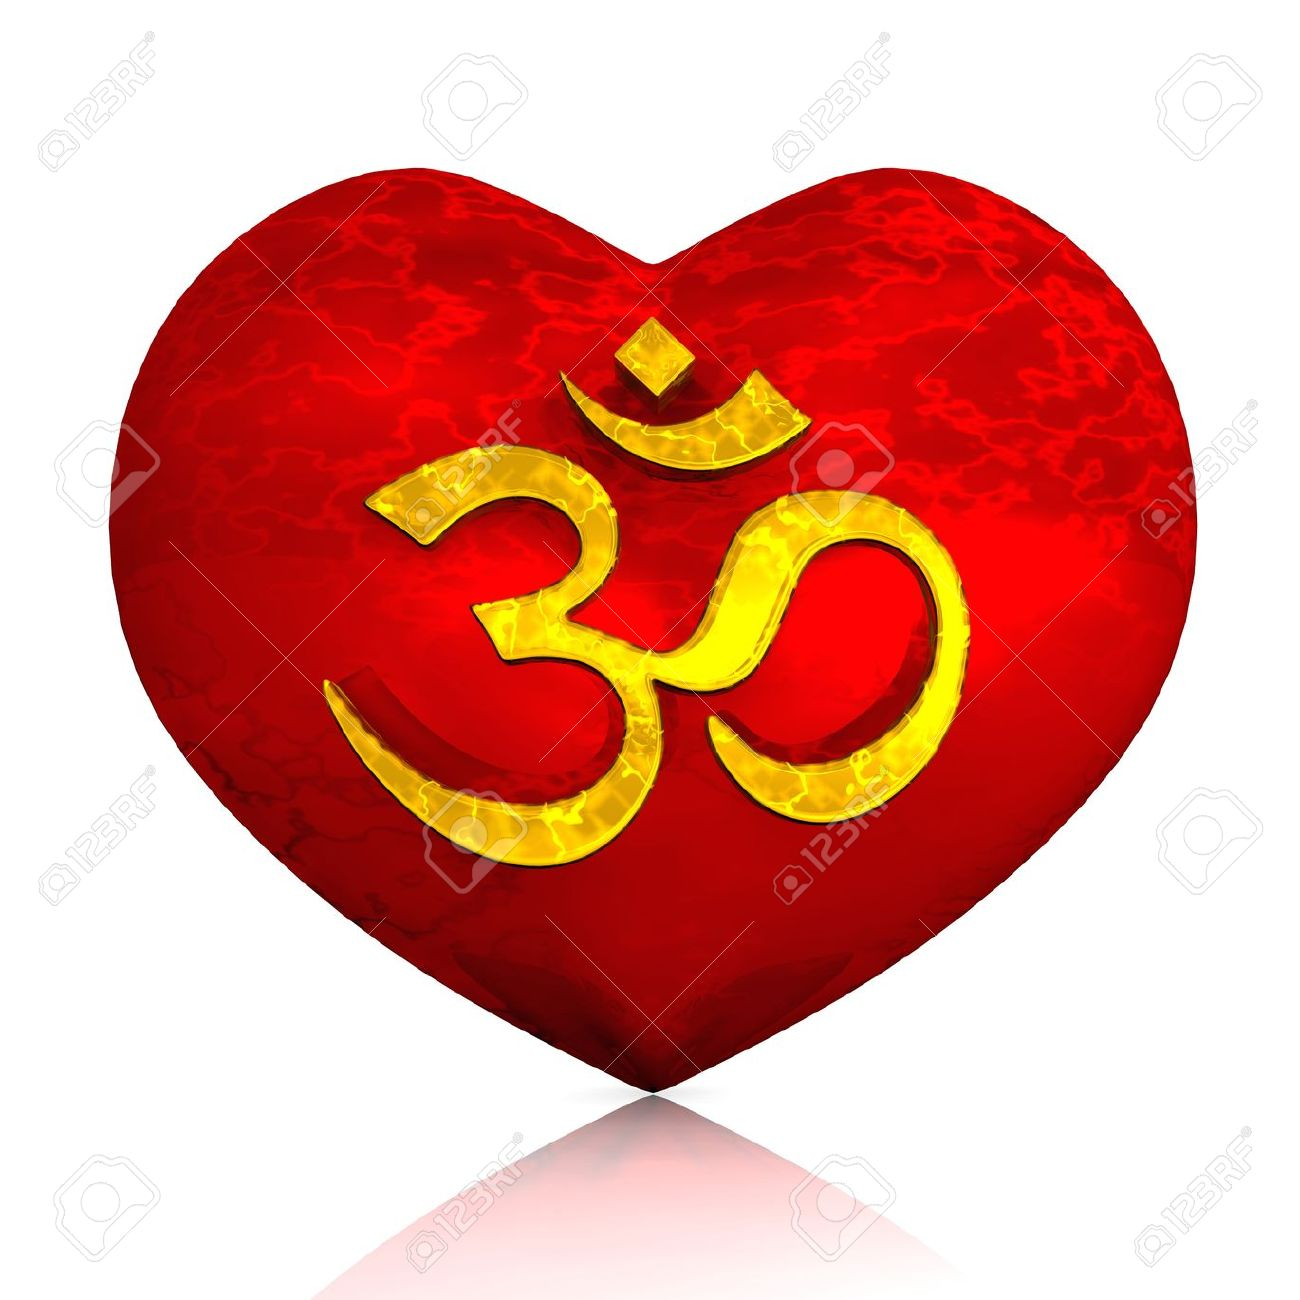 3D - Golden Om sign on red heart Stock Photo - 13945083